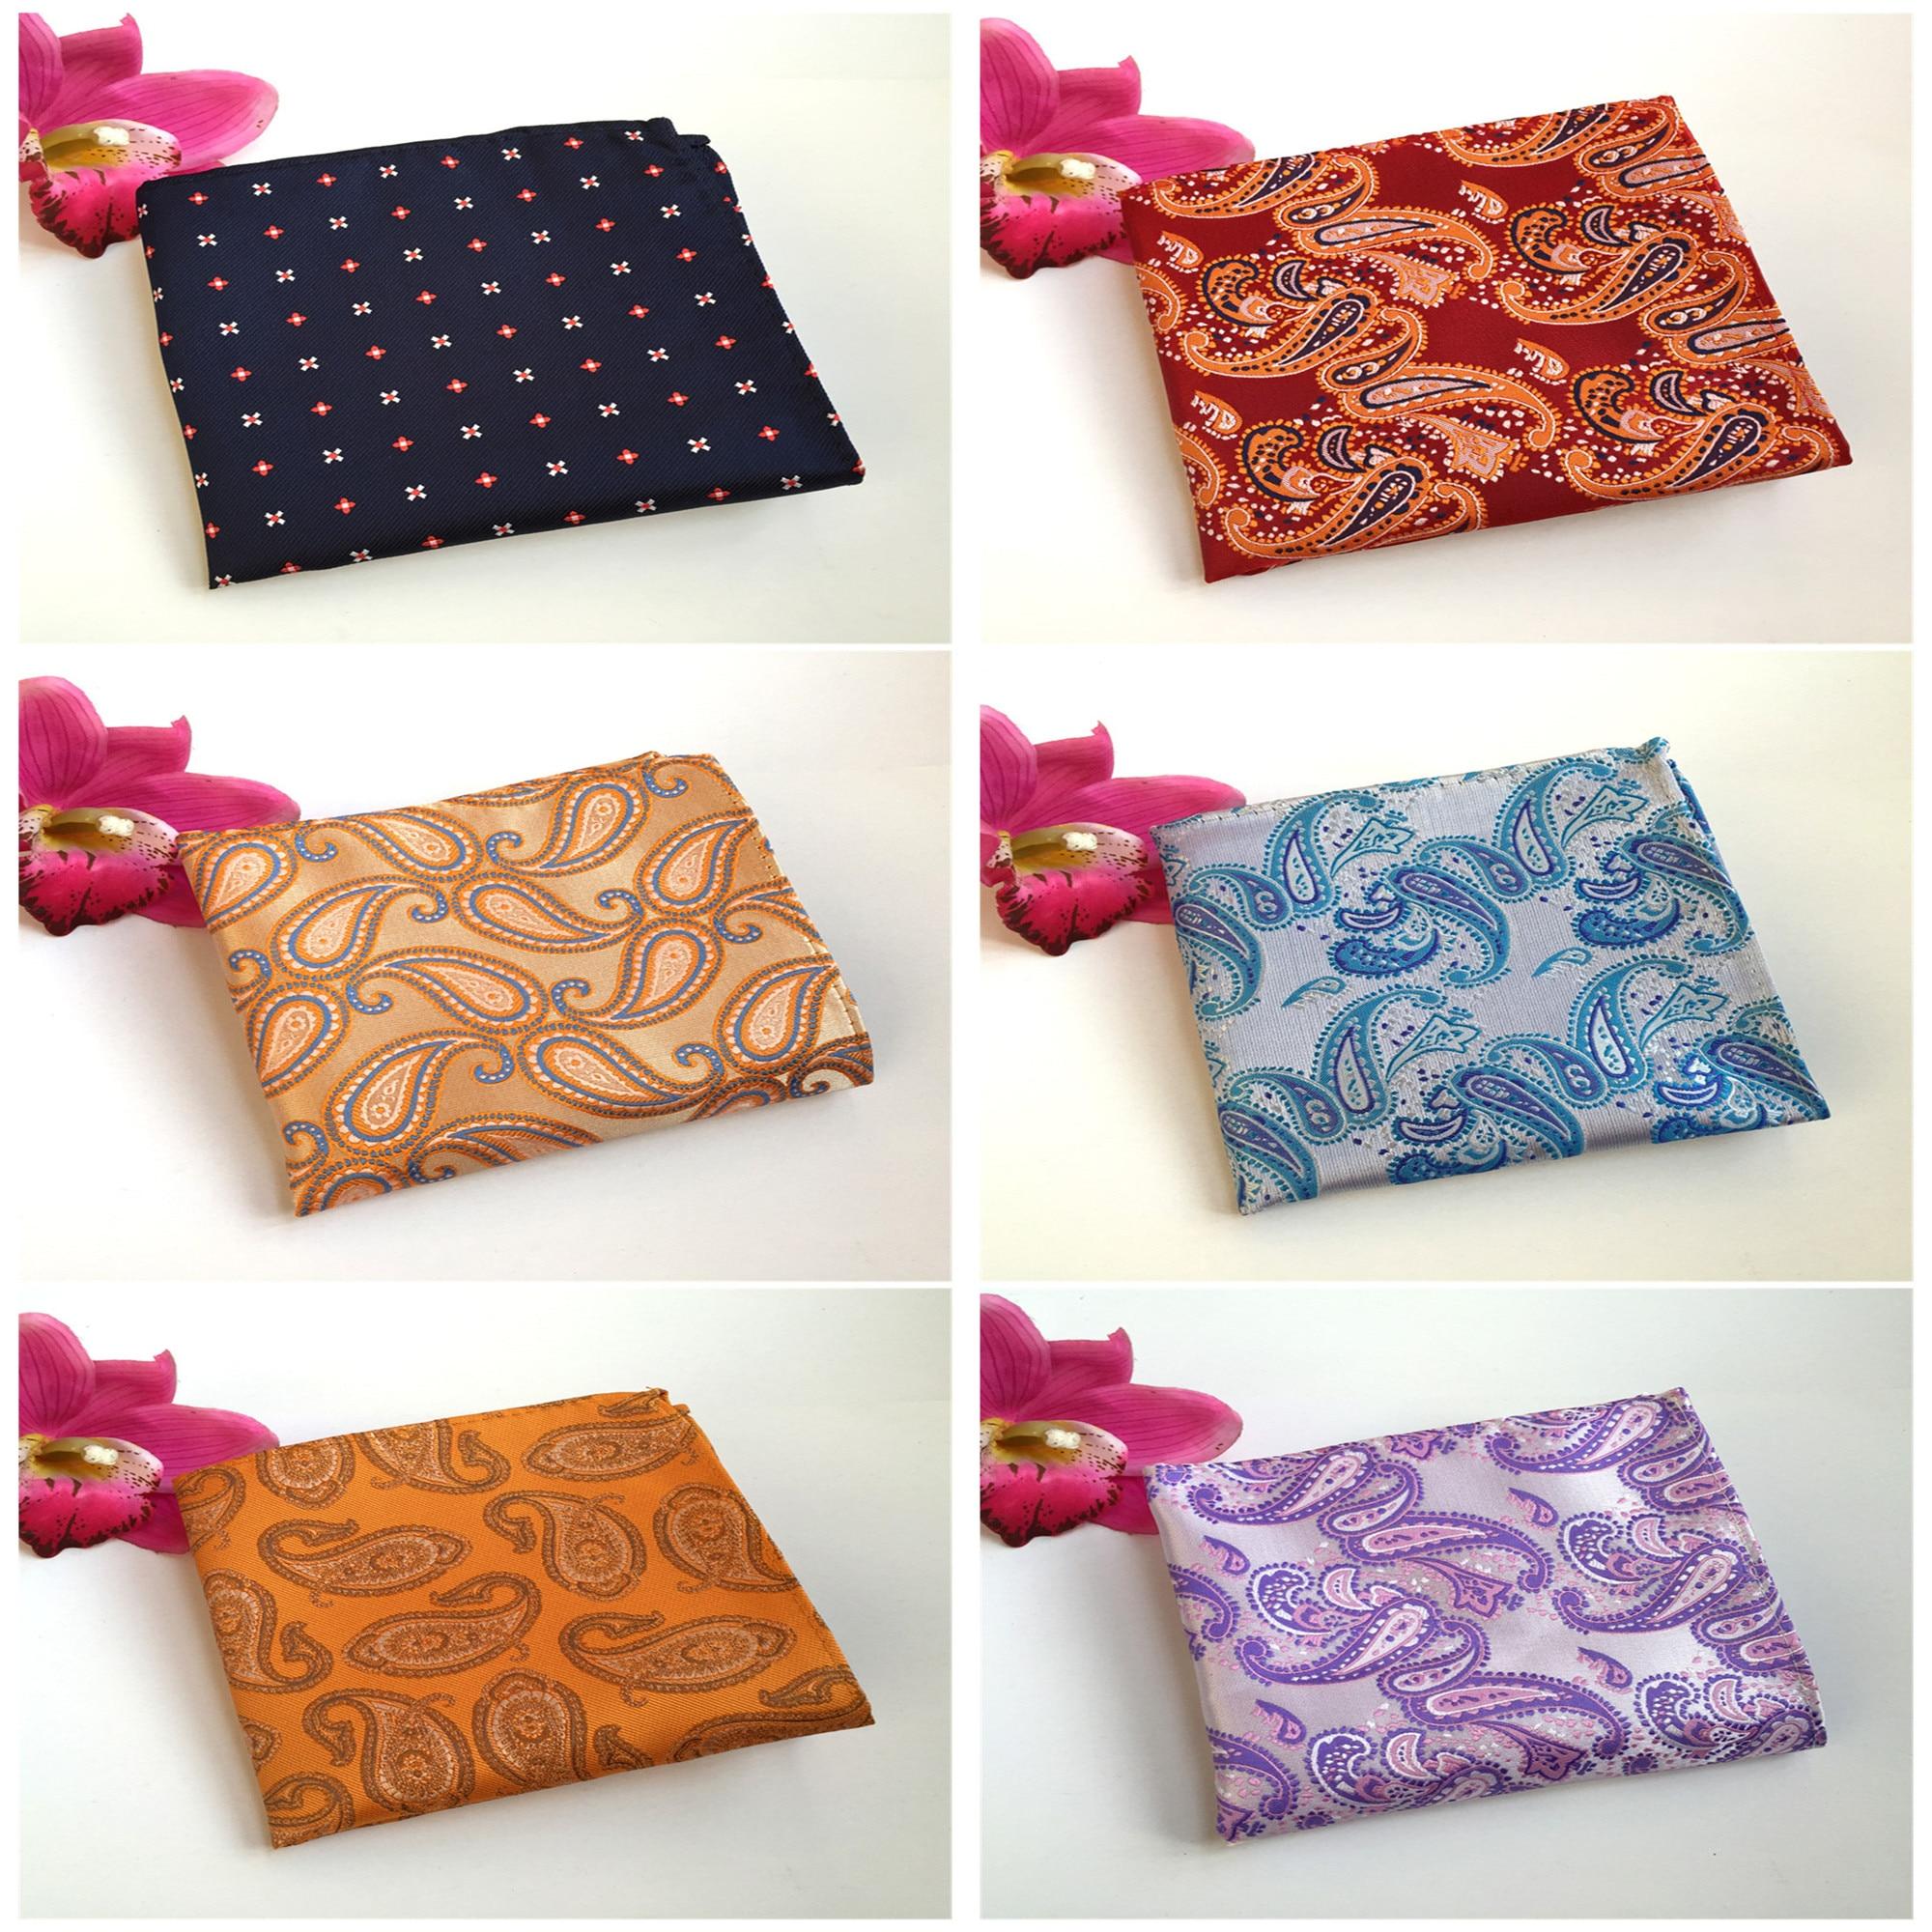 High Quality Simple Personality Fashion Decorative Pocket Towel 2020 High Quality Men's Business Handkerchief Pocket Towel